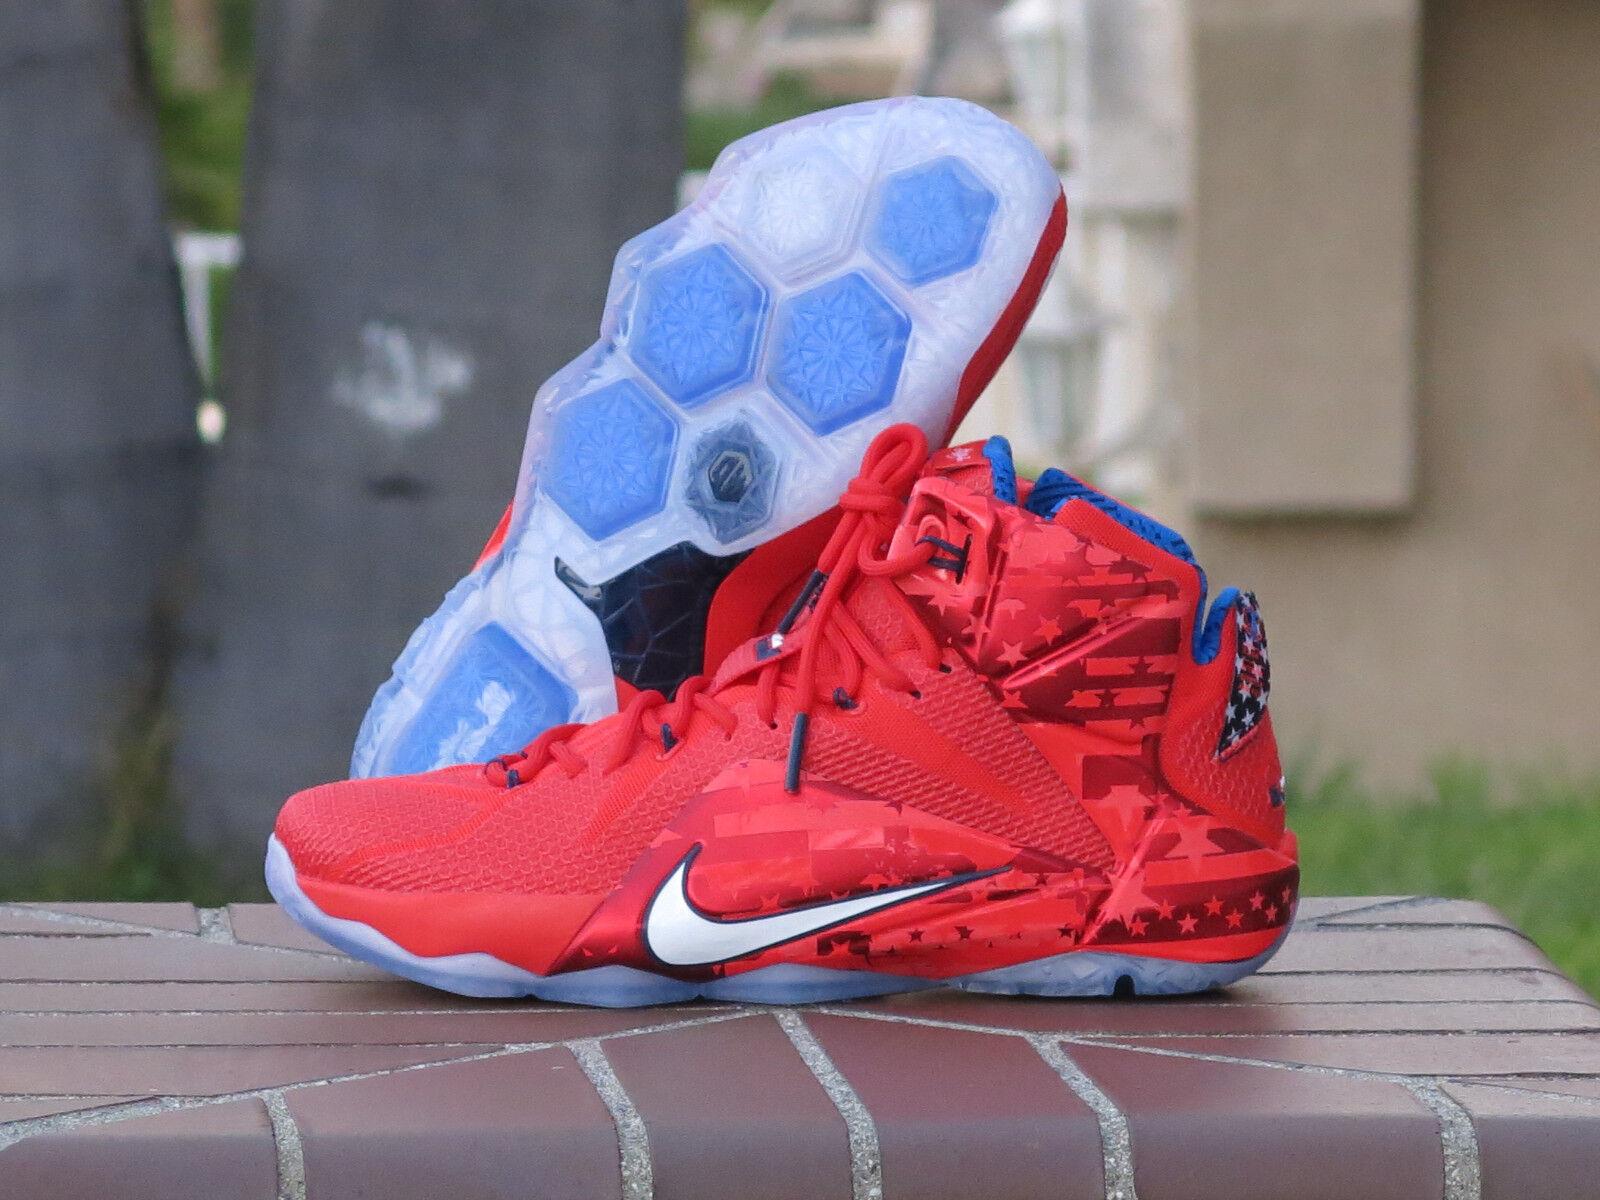 Nike LeBron XII 4th of July Men's Basketball Shoes elite USA 684593-616 SZ 10.5